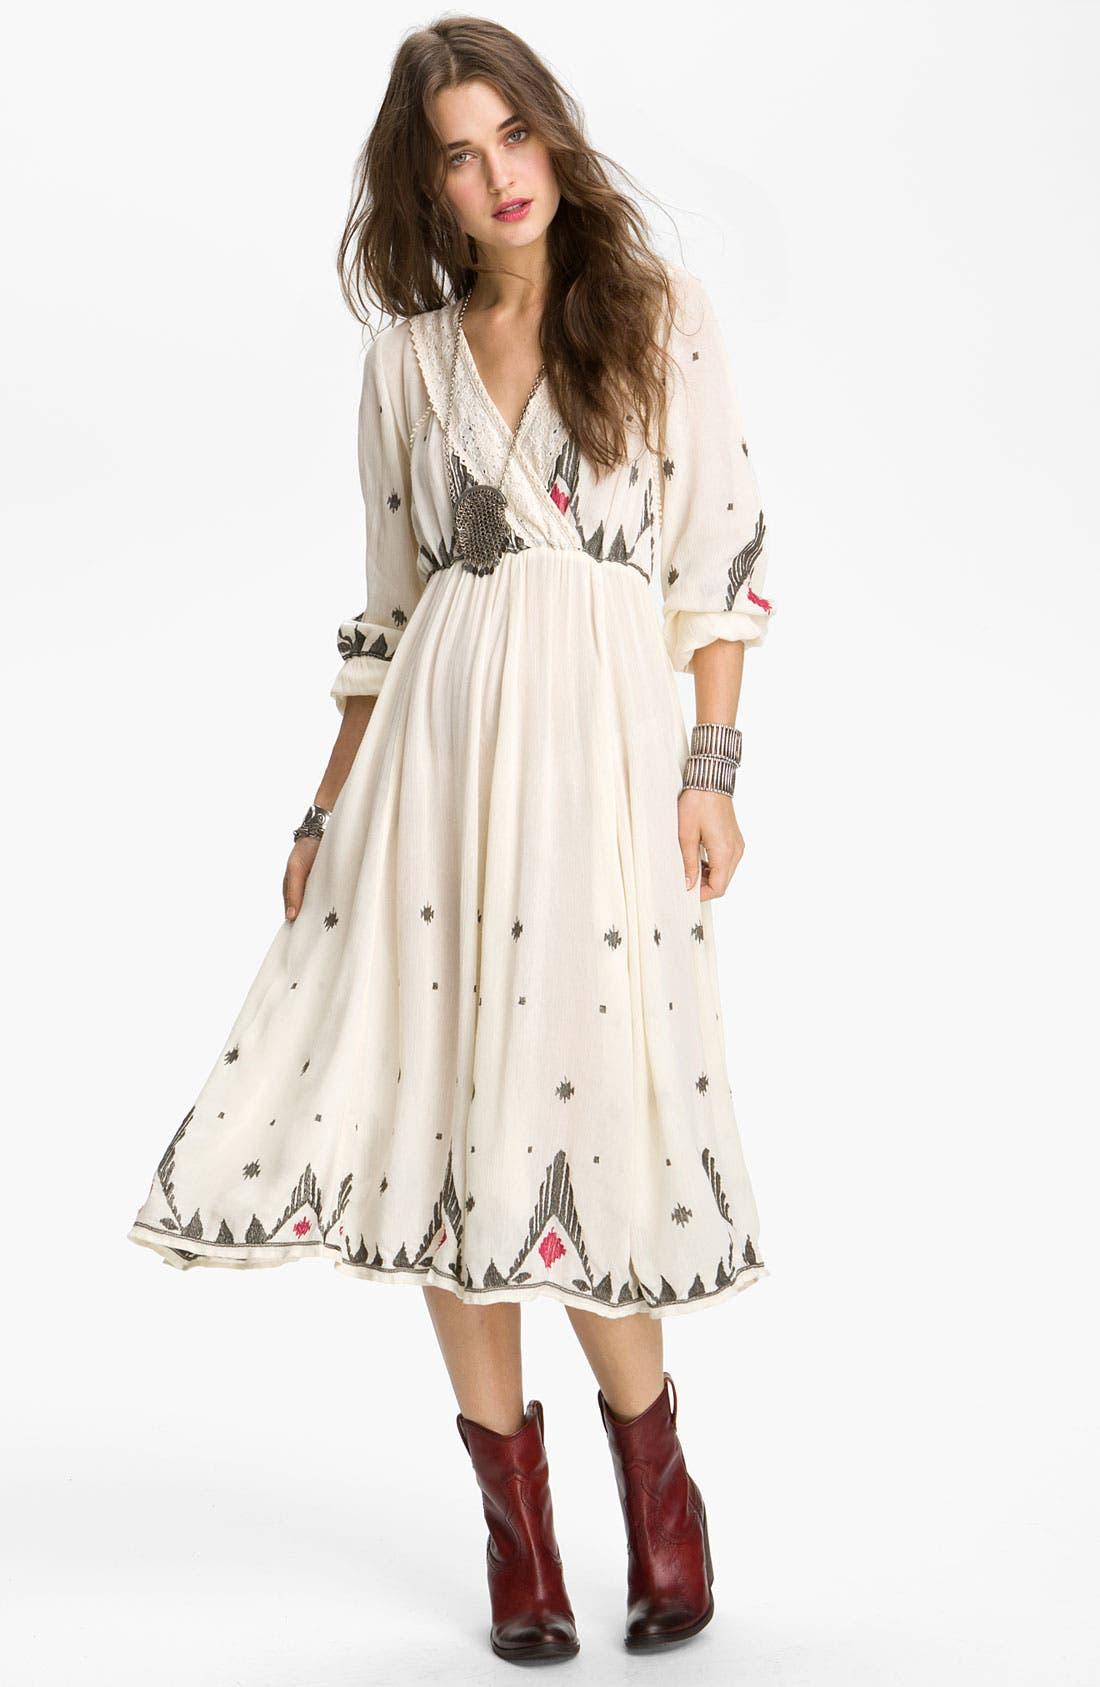 Main Image - Free People 'Splendor' Embroidered Peasant Dress